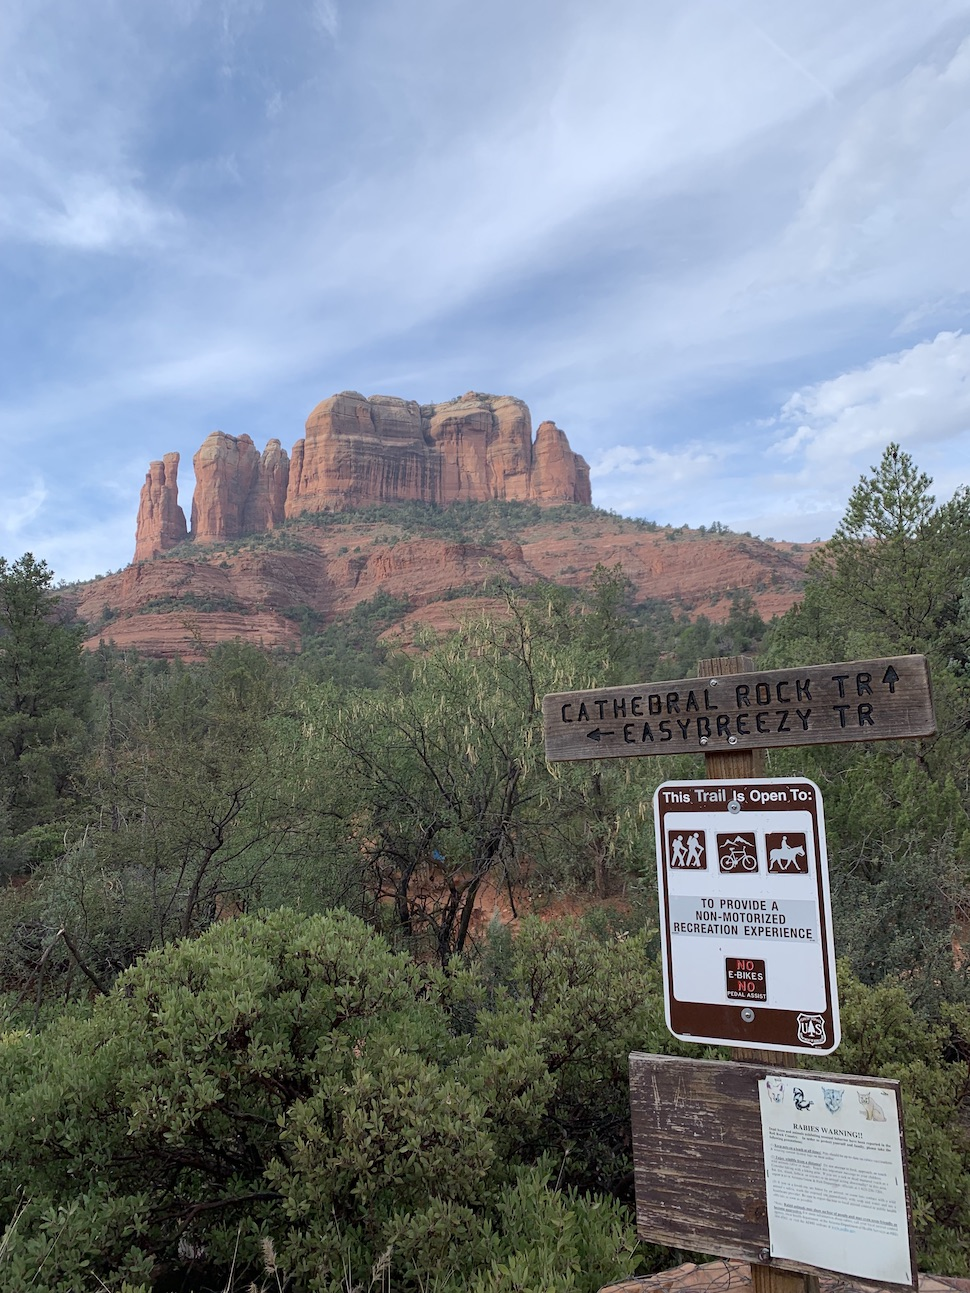 Catheral Rocks Trailhead Sign in Sedona Arizona